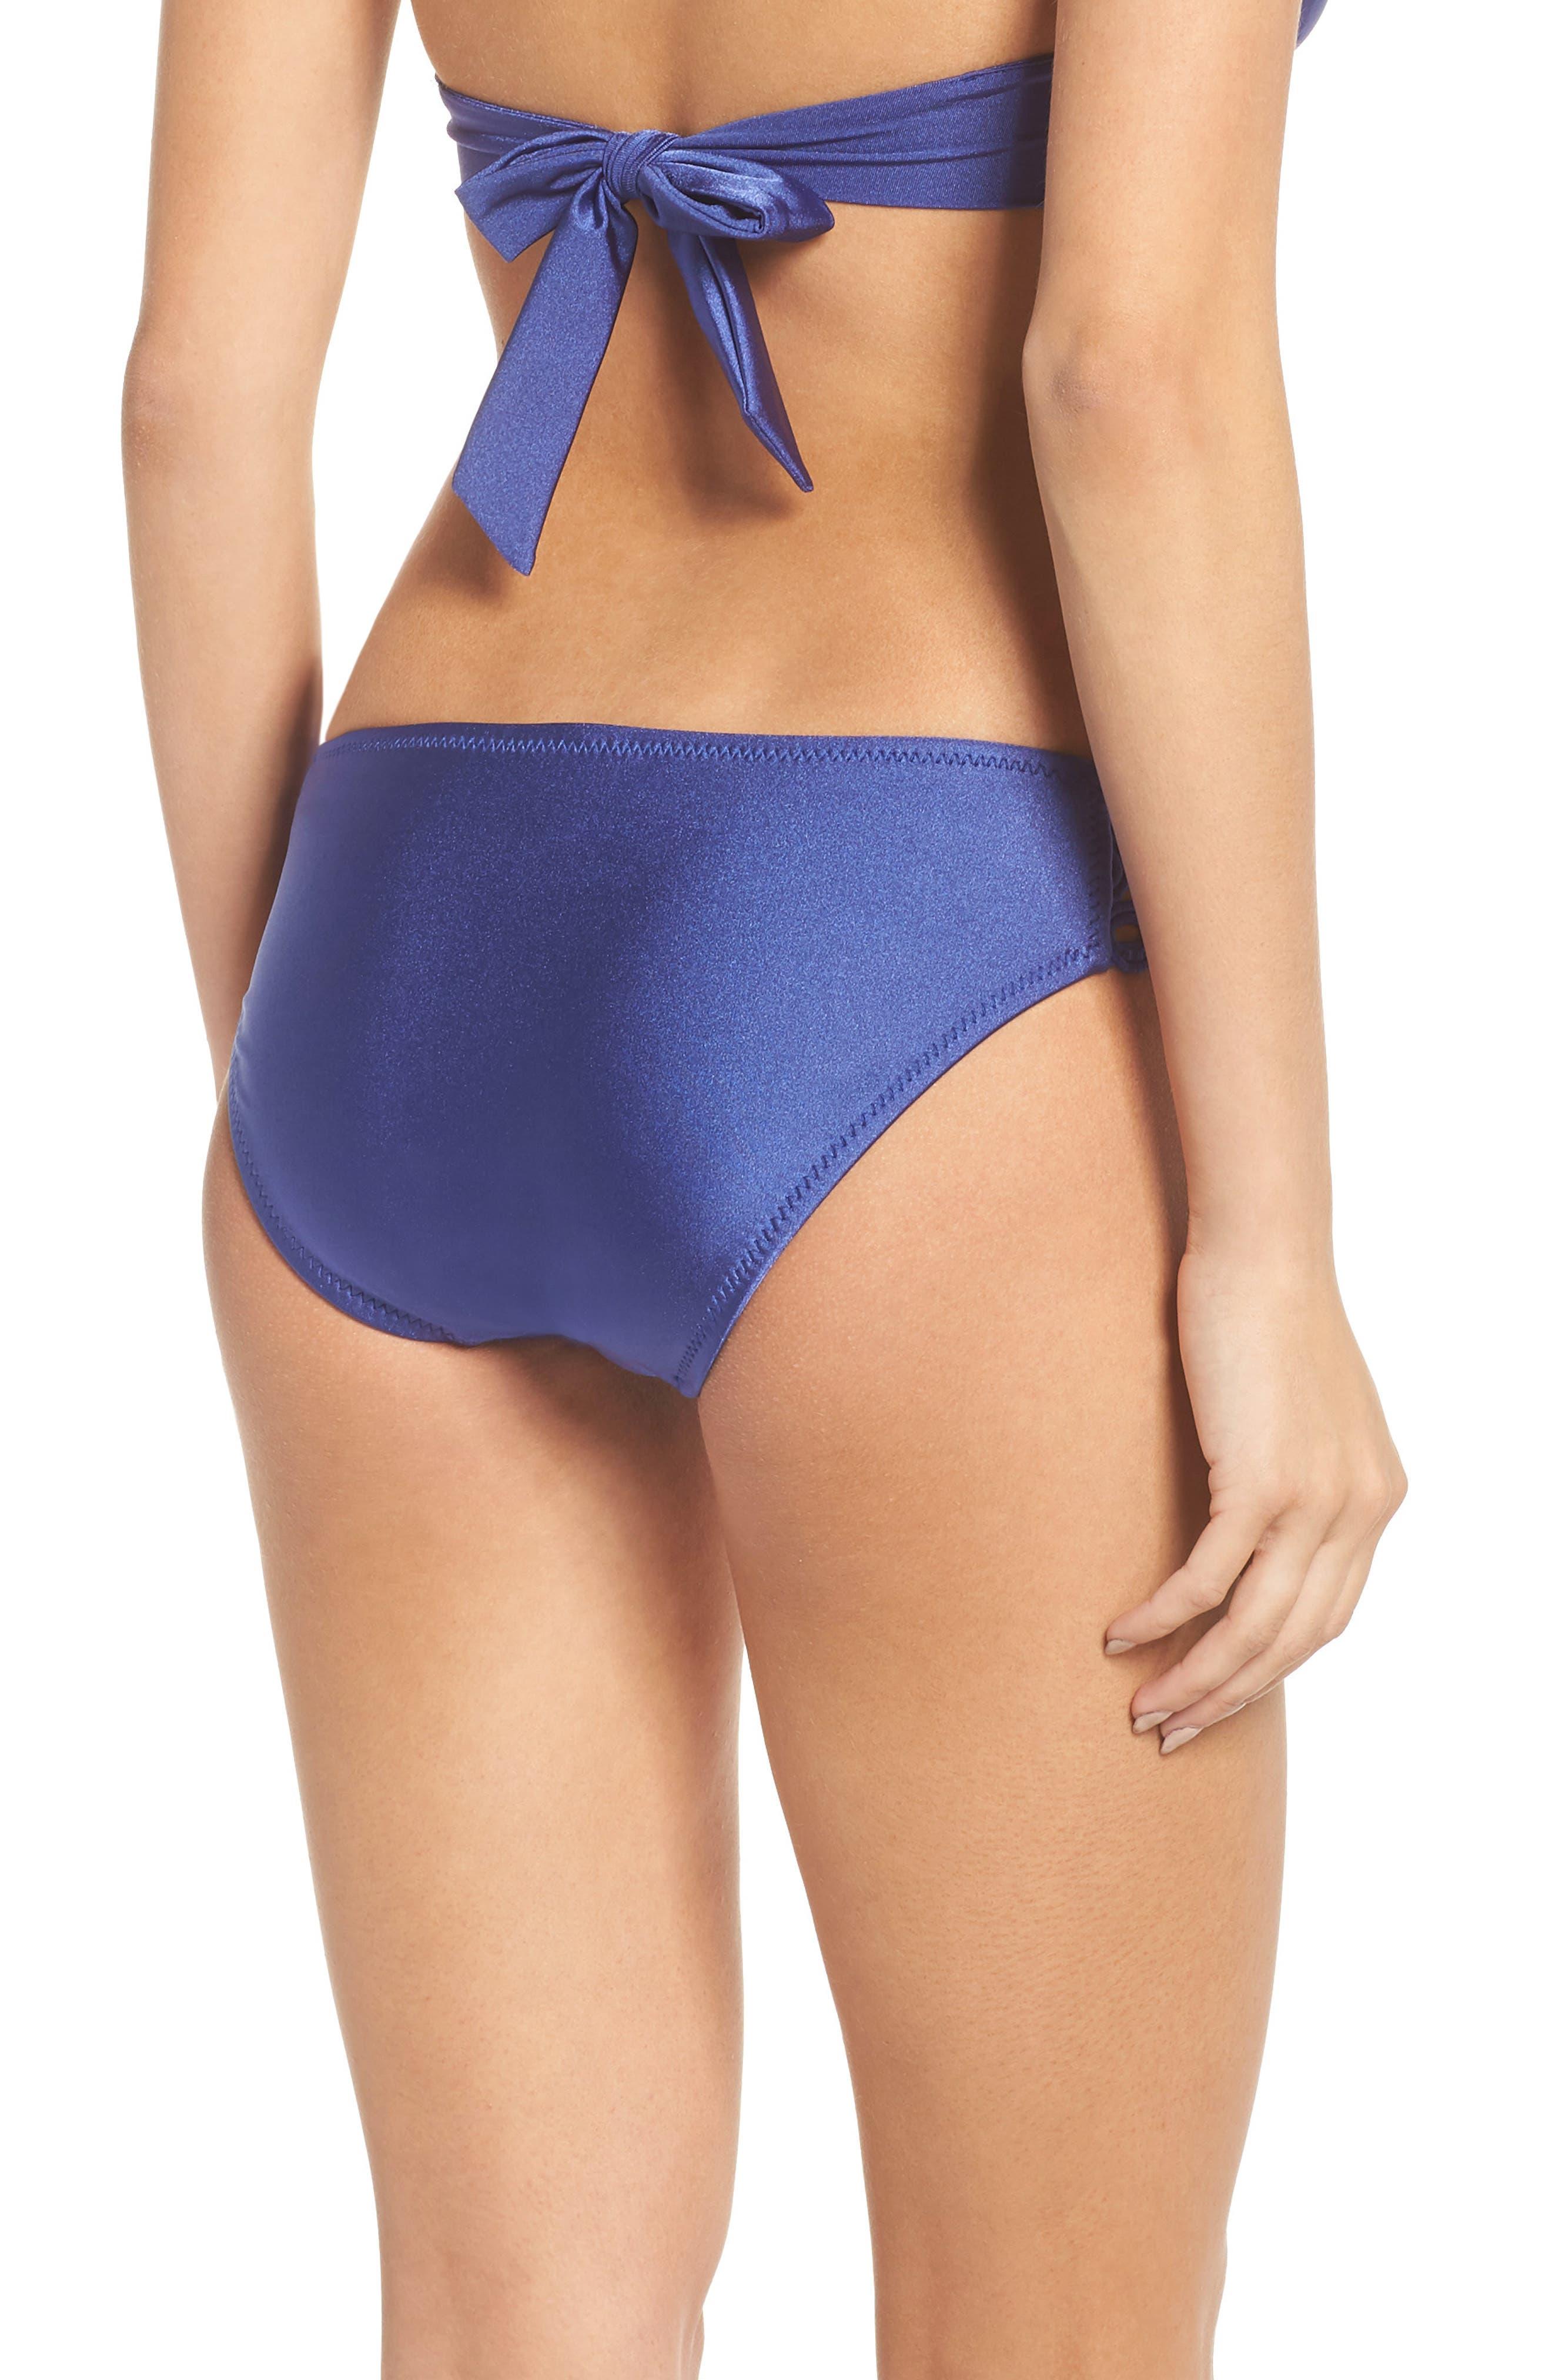 Siren Bikini Bottoms,                             Alternate thumbnail 2, color,                             BLUE TOPAZ